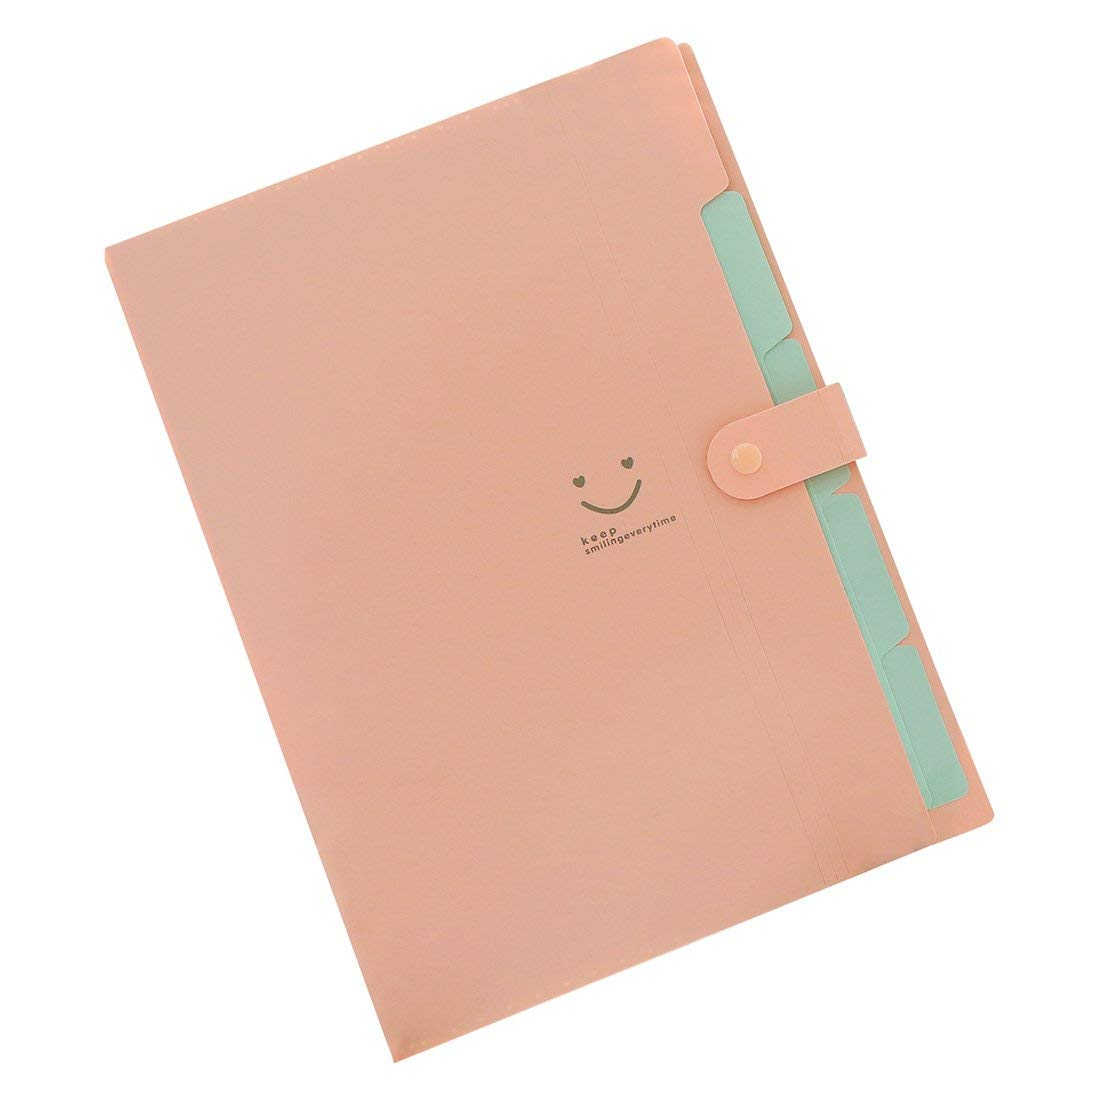 Amazon.com : SODIAL(R) Kawaii FoldersStationery Carpeta File Folder 5layers Archivadores Rings A4 Document Bag Office Carpetas£¨Pink£ : Office Products